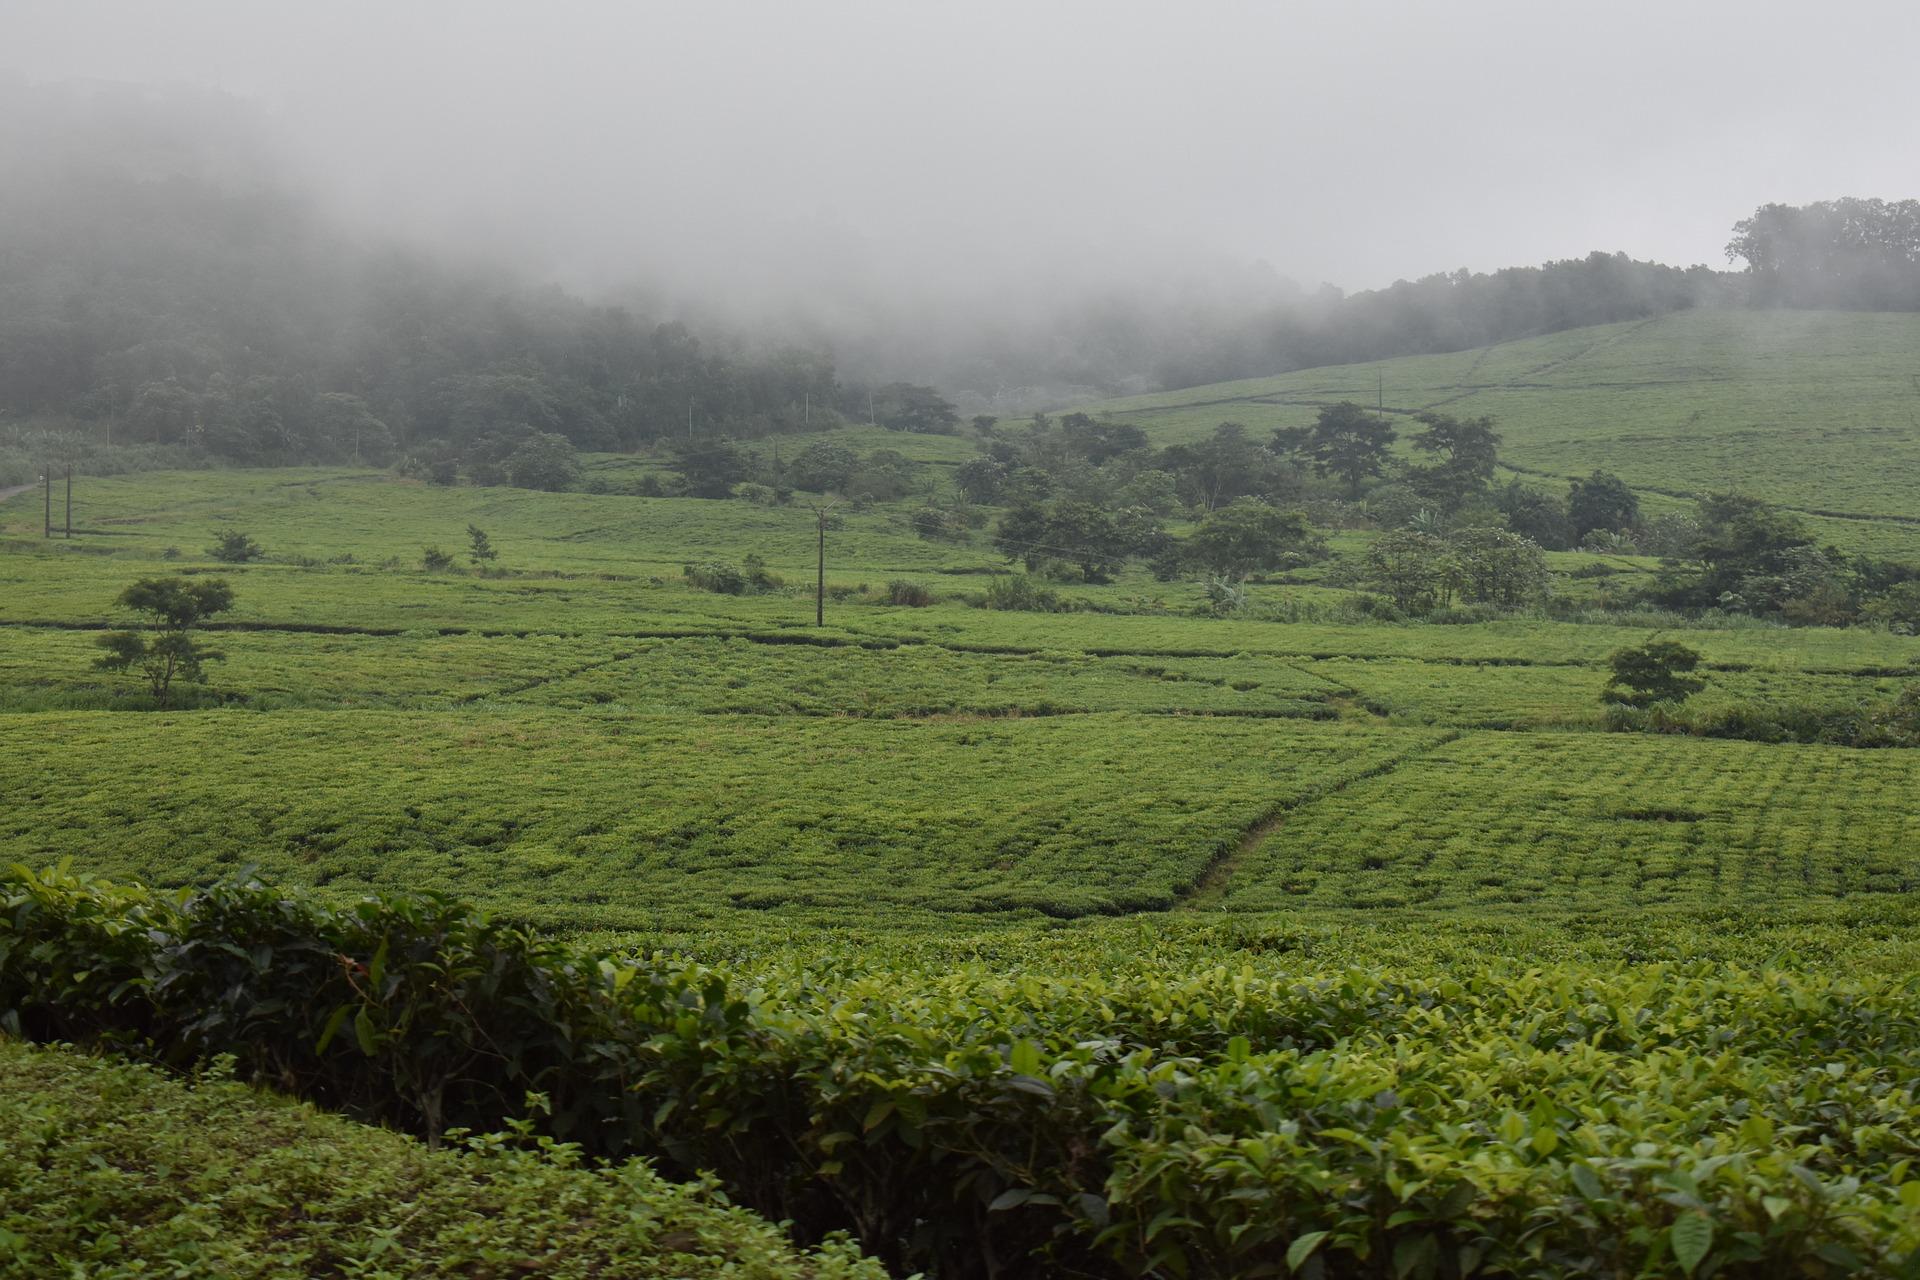 Analizan impacto de COVID-19 en sector agropecuario